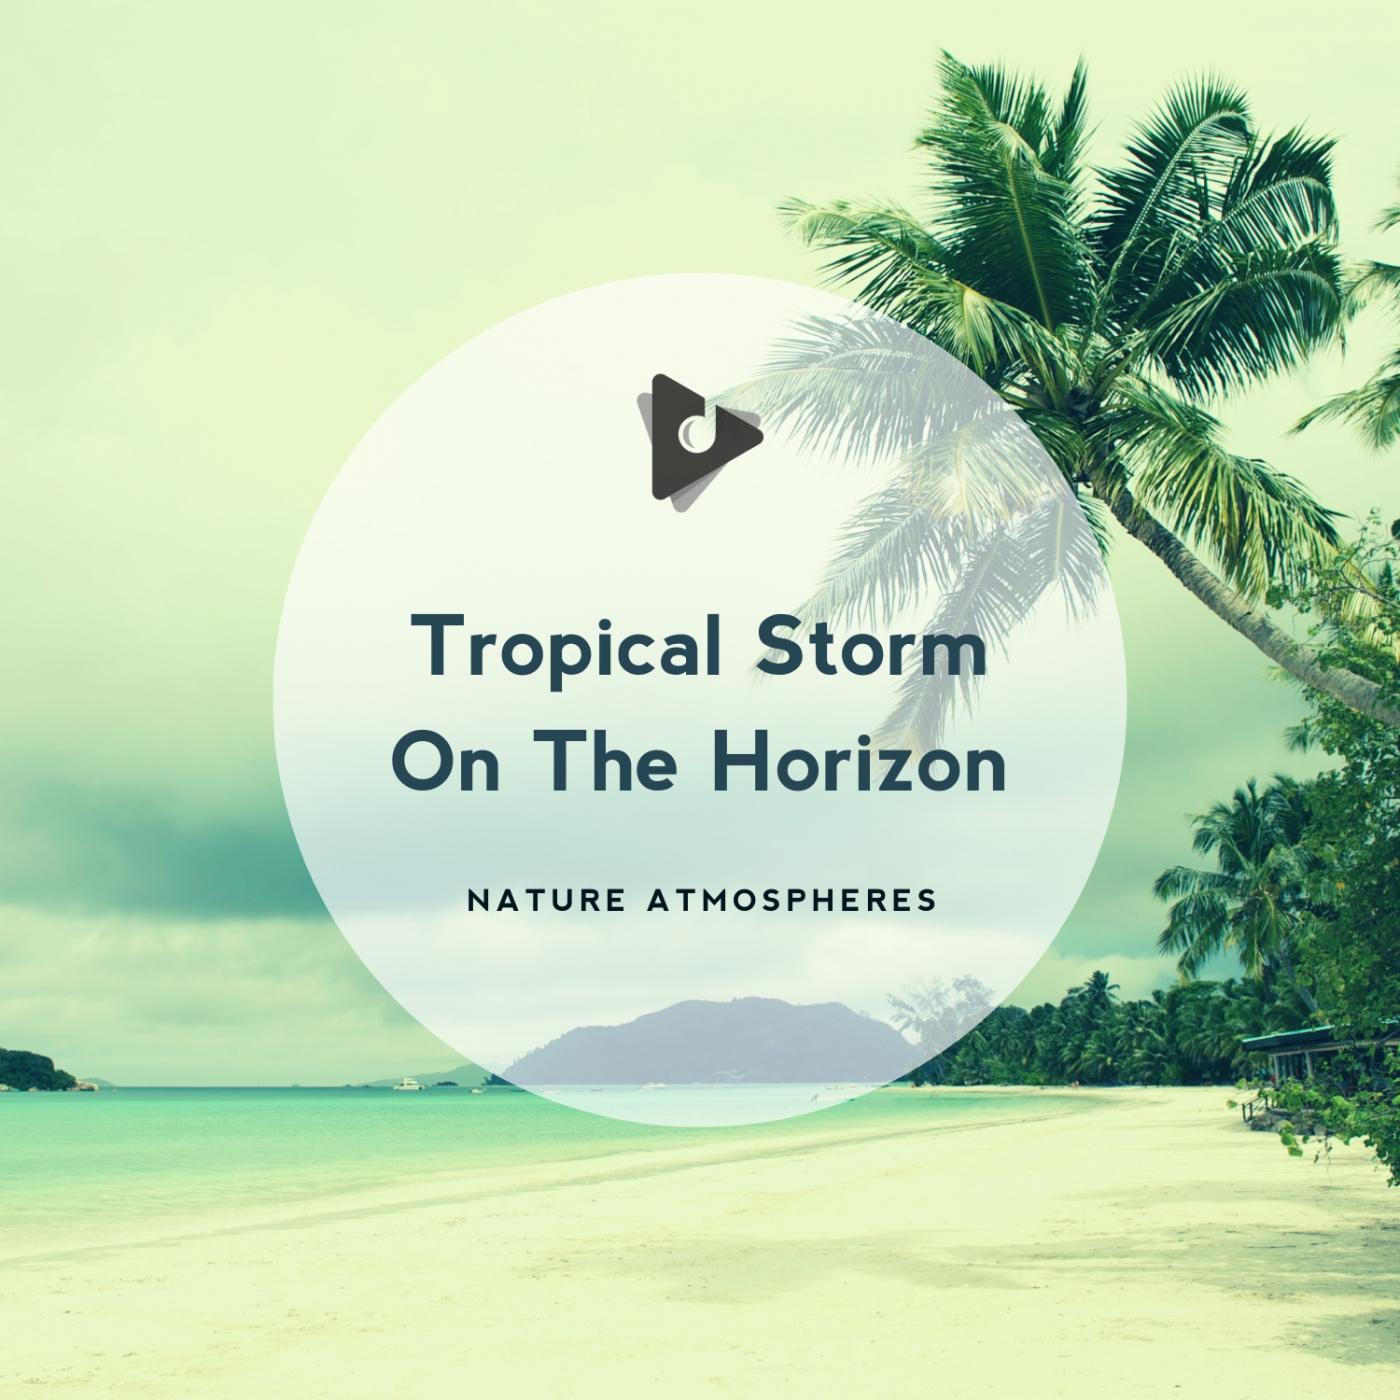 Tropical Storm On The Horizon